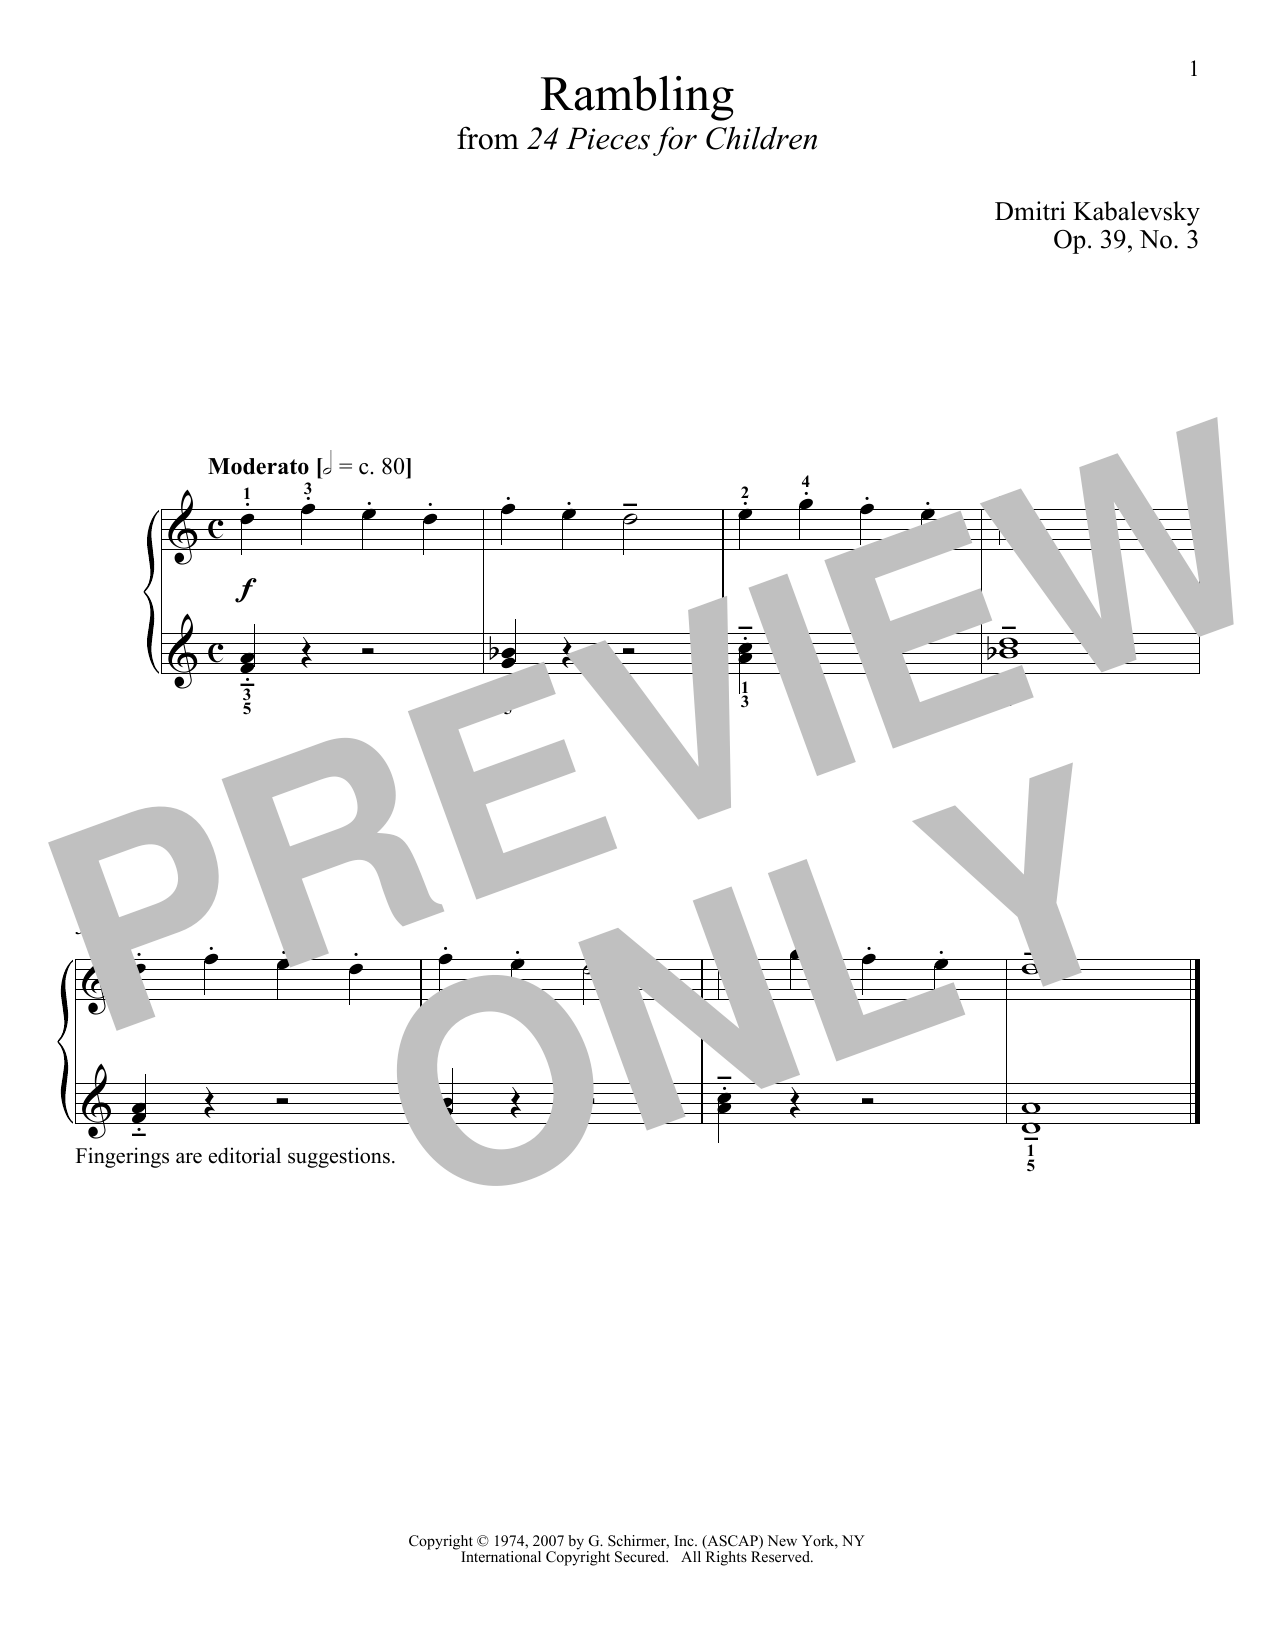 Dmitri Kabalevsky Rambling, Op. 39, No. 3 sheet music notes and chords. Download Printable PDF.